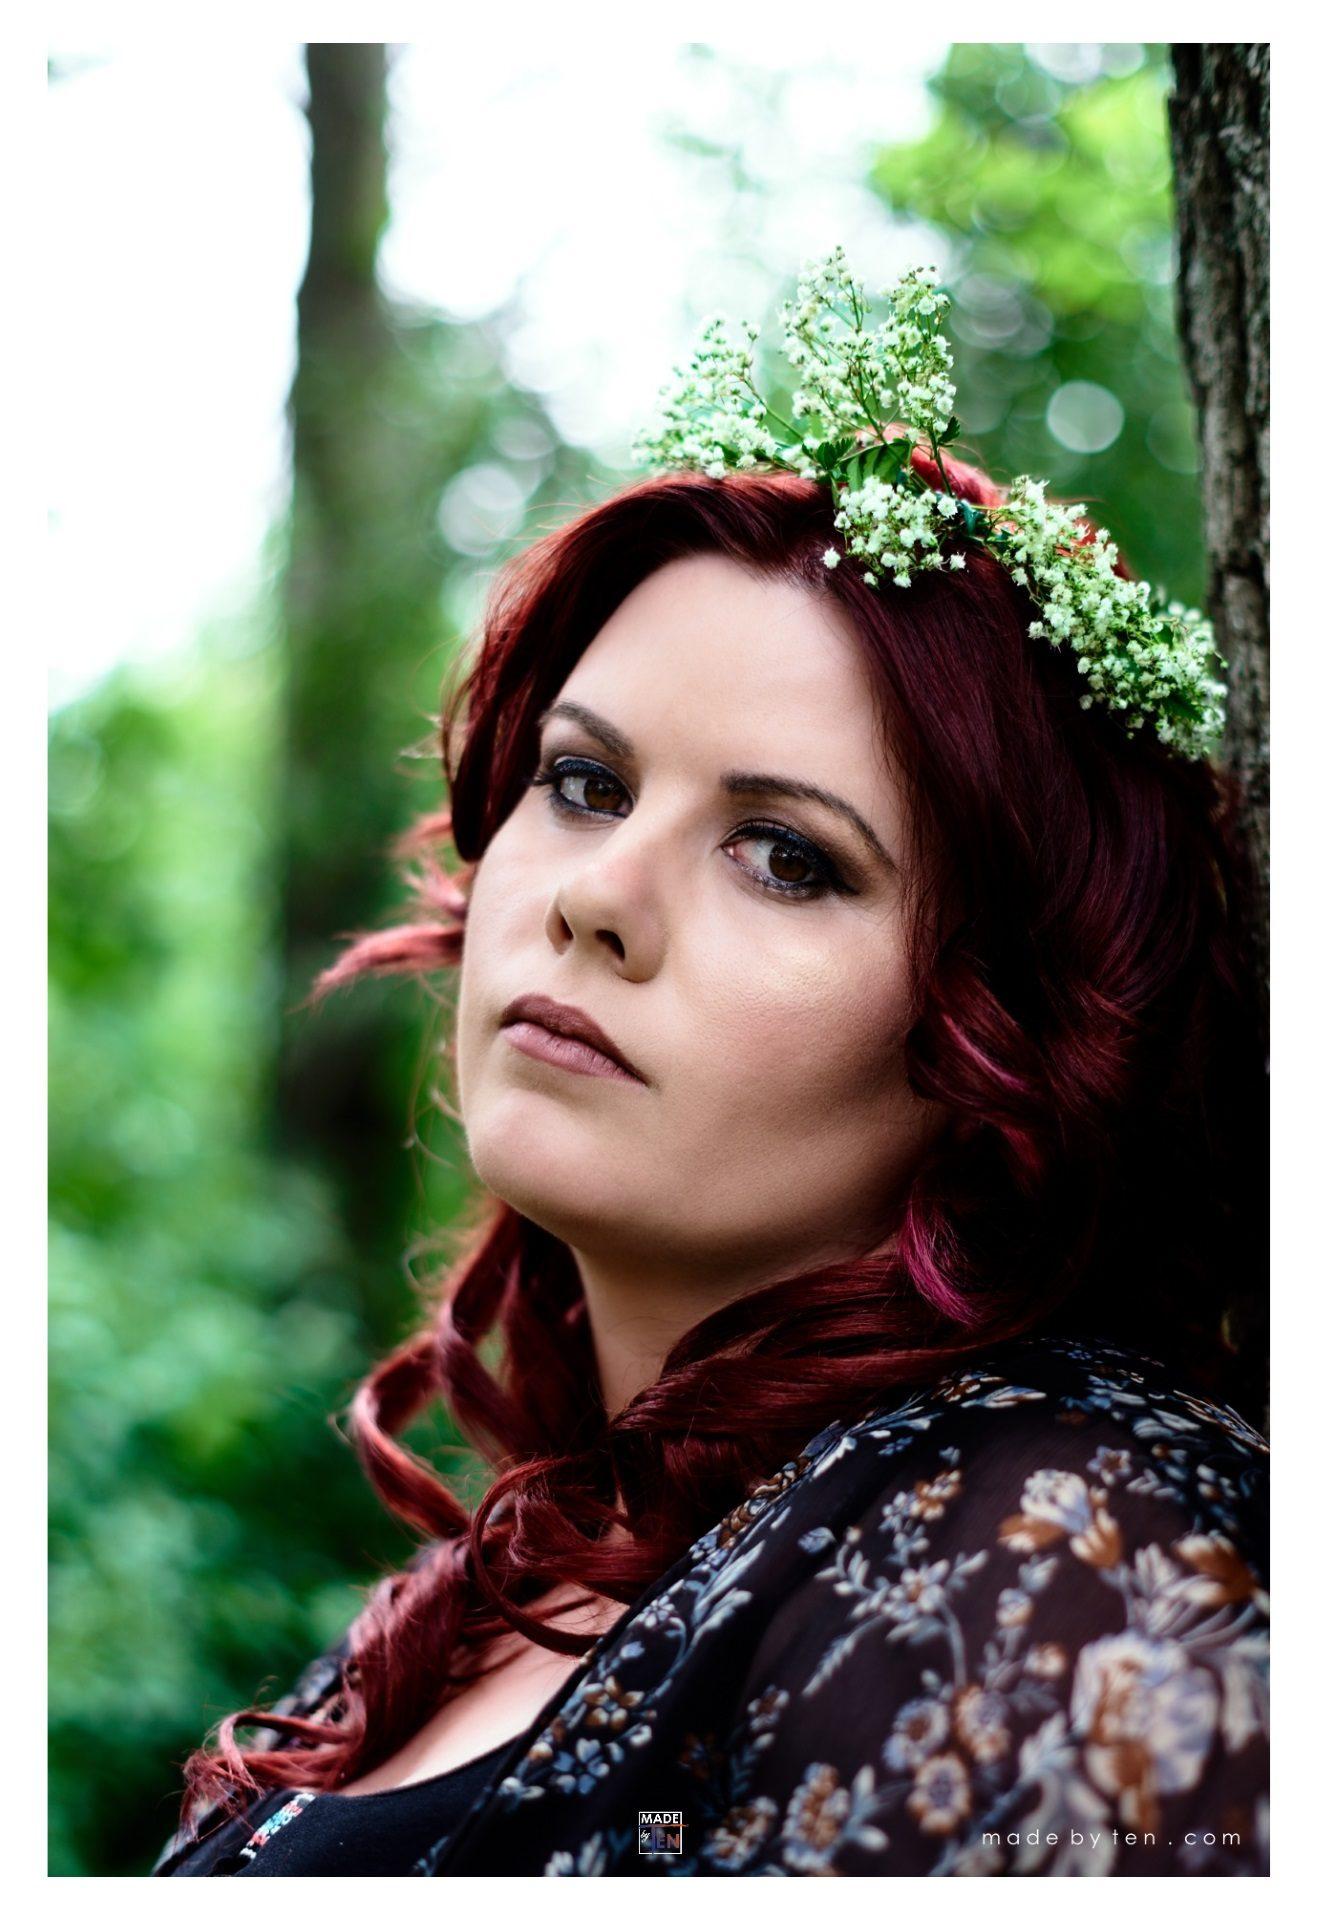 Woman Earth Child Beautiful Flower Crown - GTA Women Fantasy Photography